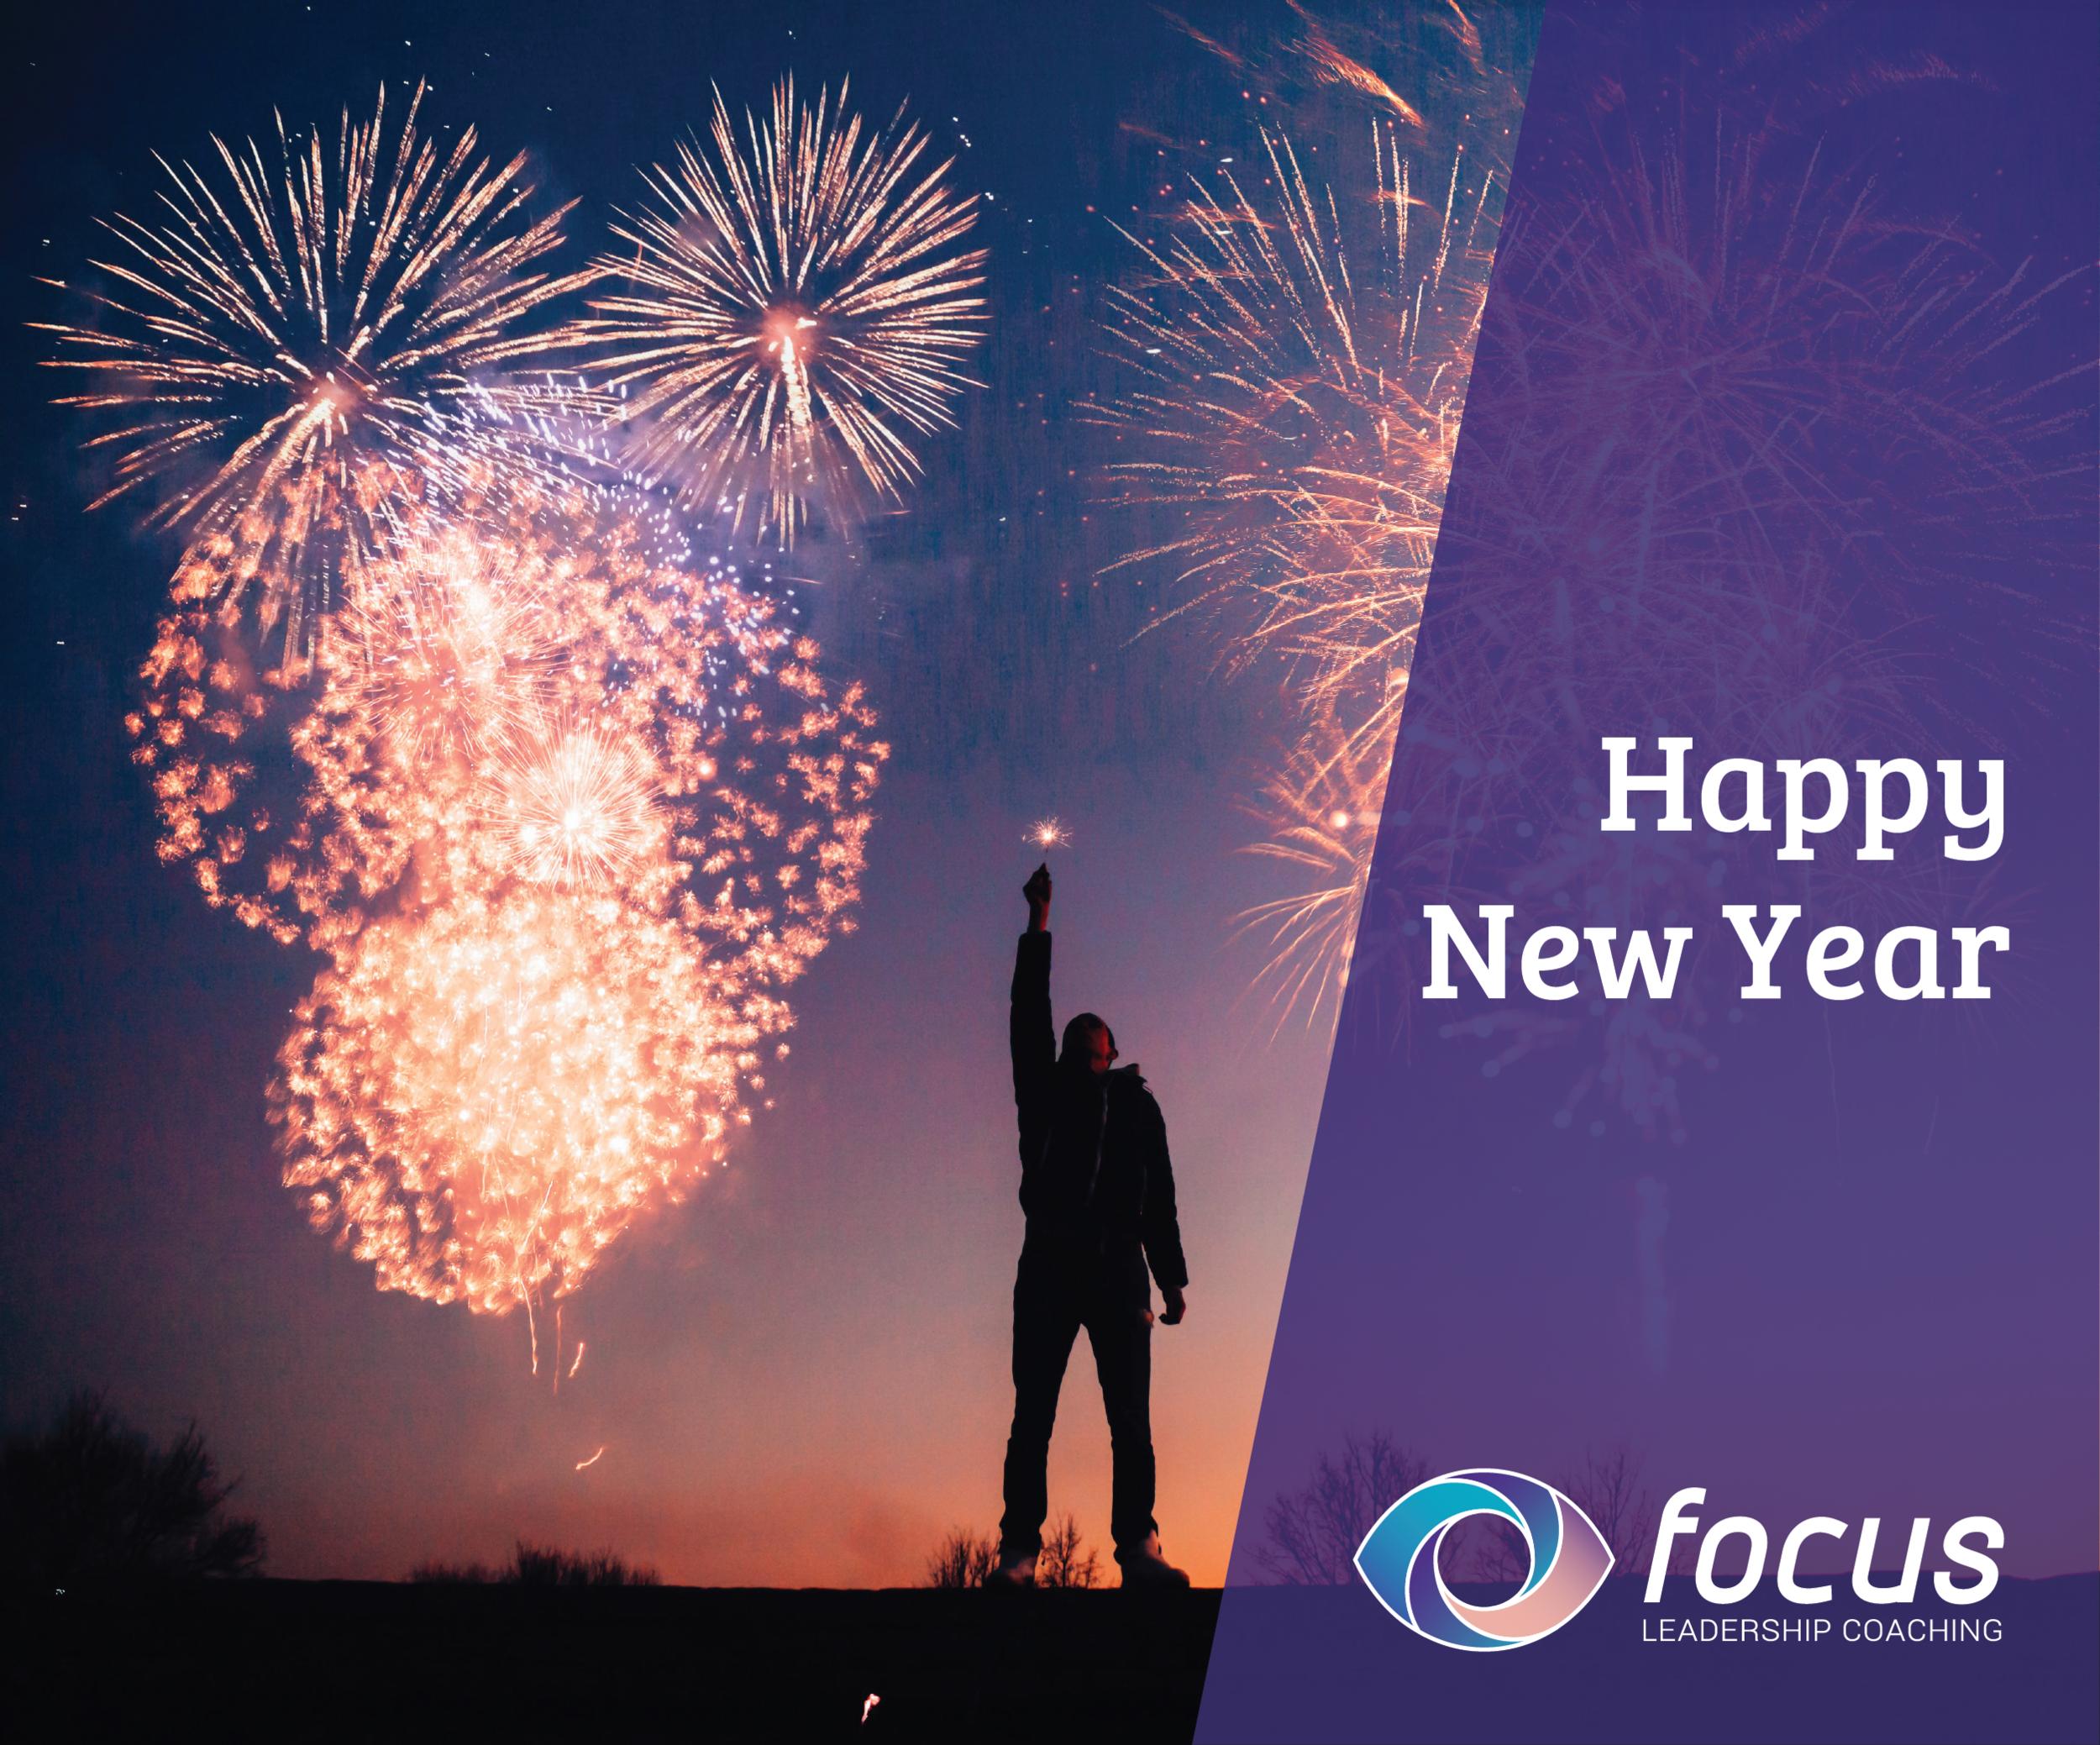 focus-new-year